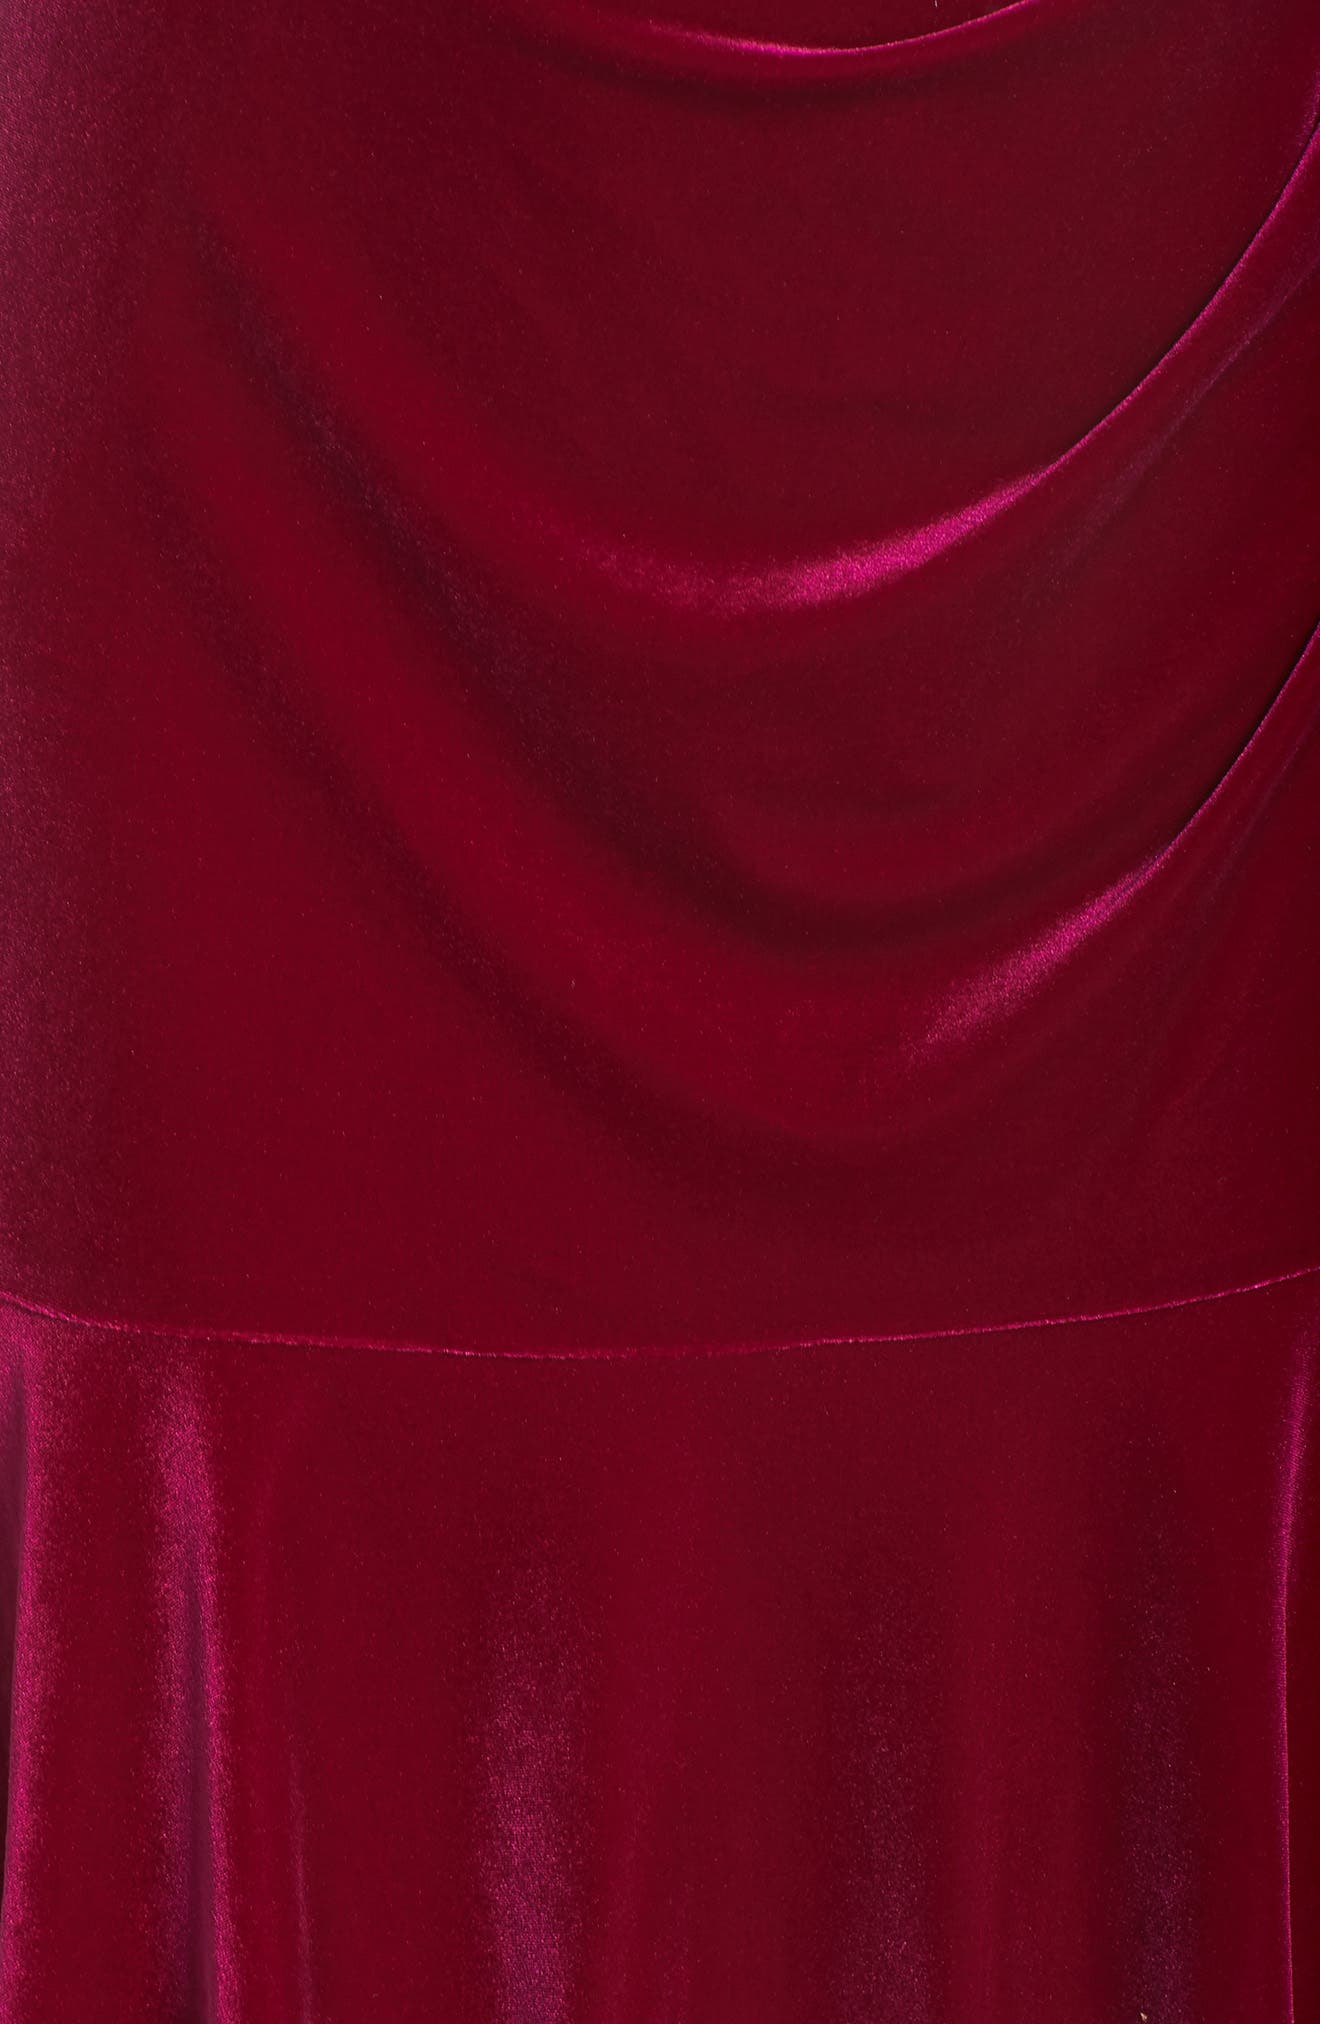 Draped Velvet Sheath Dress,                             Alternate thumbnail 6, color,                             FUCHSIA